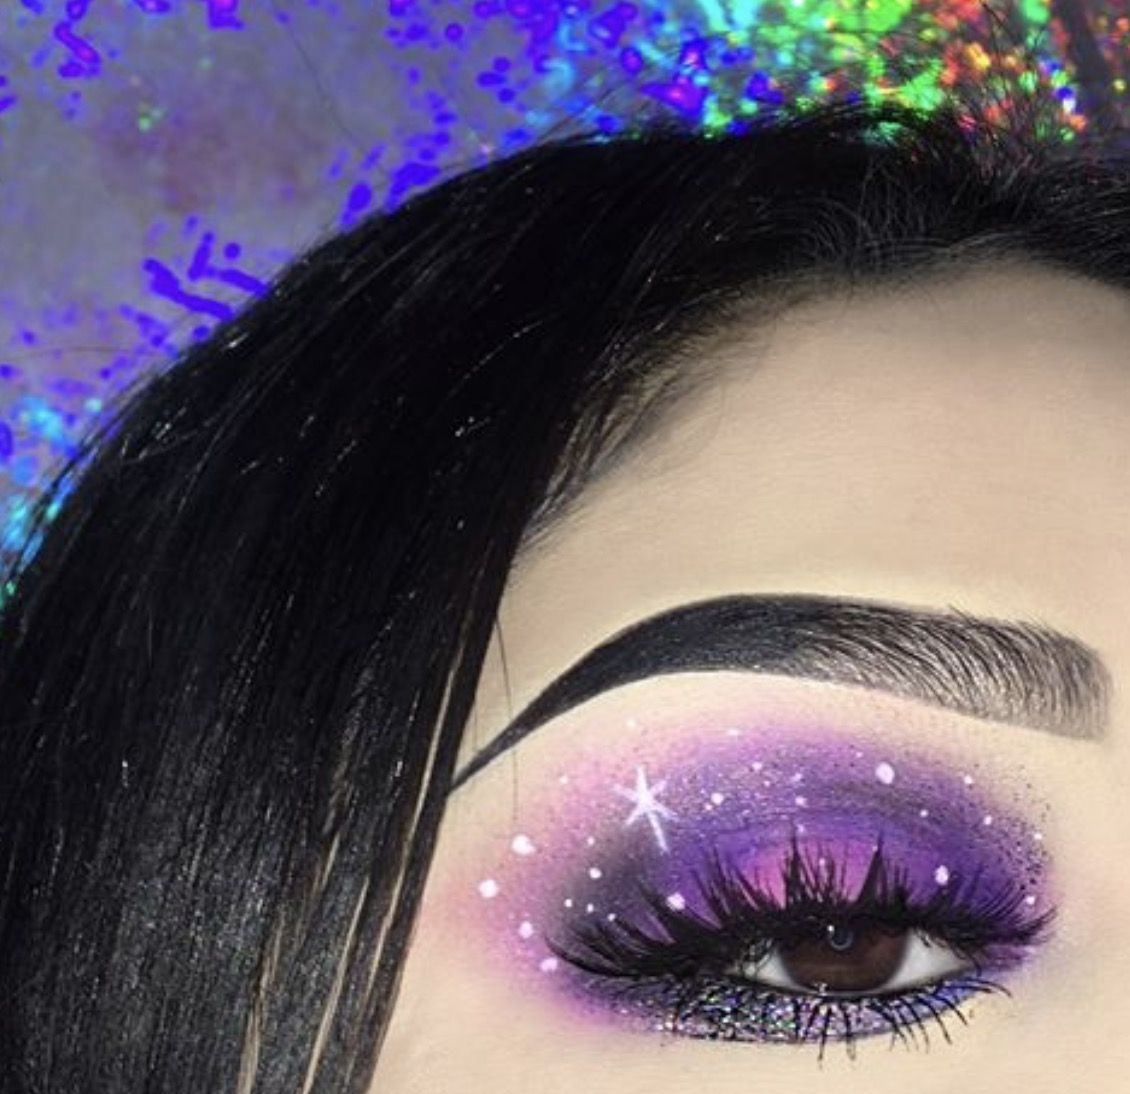 Purple Galaxy Eyeshadow Pinterest Edithh6606 Galaxy Makeup Makeup Looks Blue Eyes Eye Makeup Tips